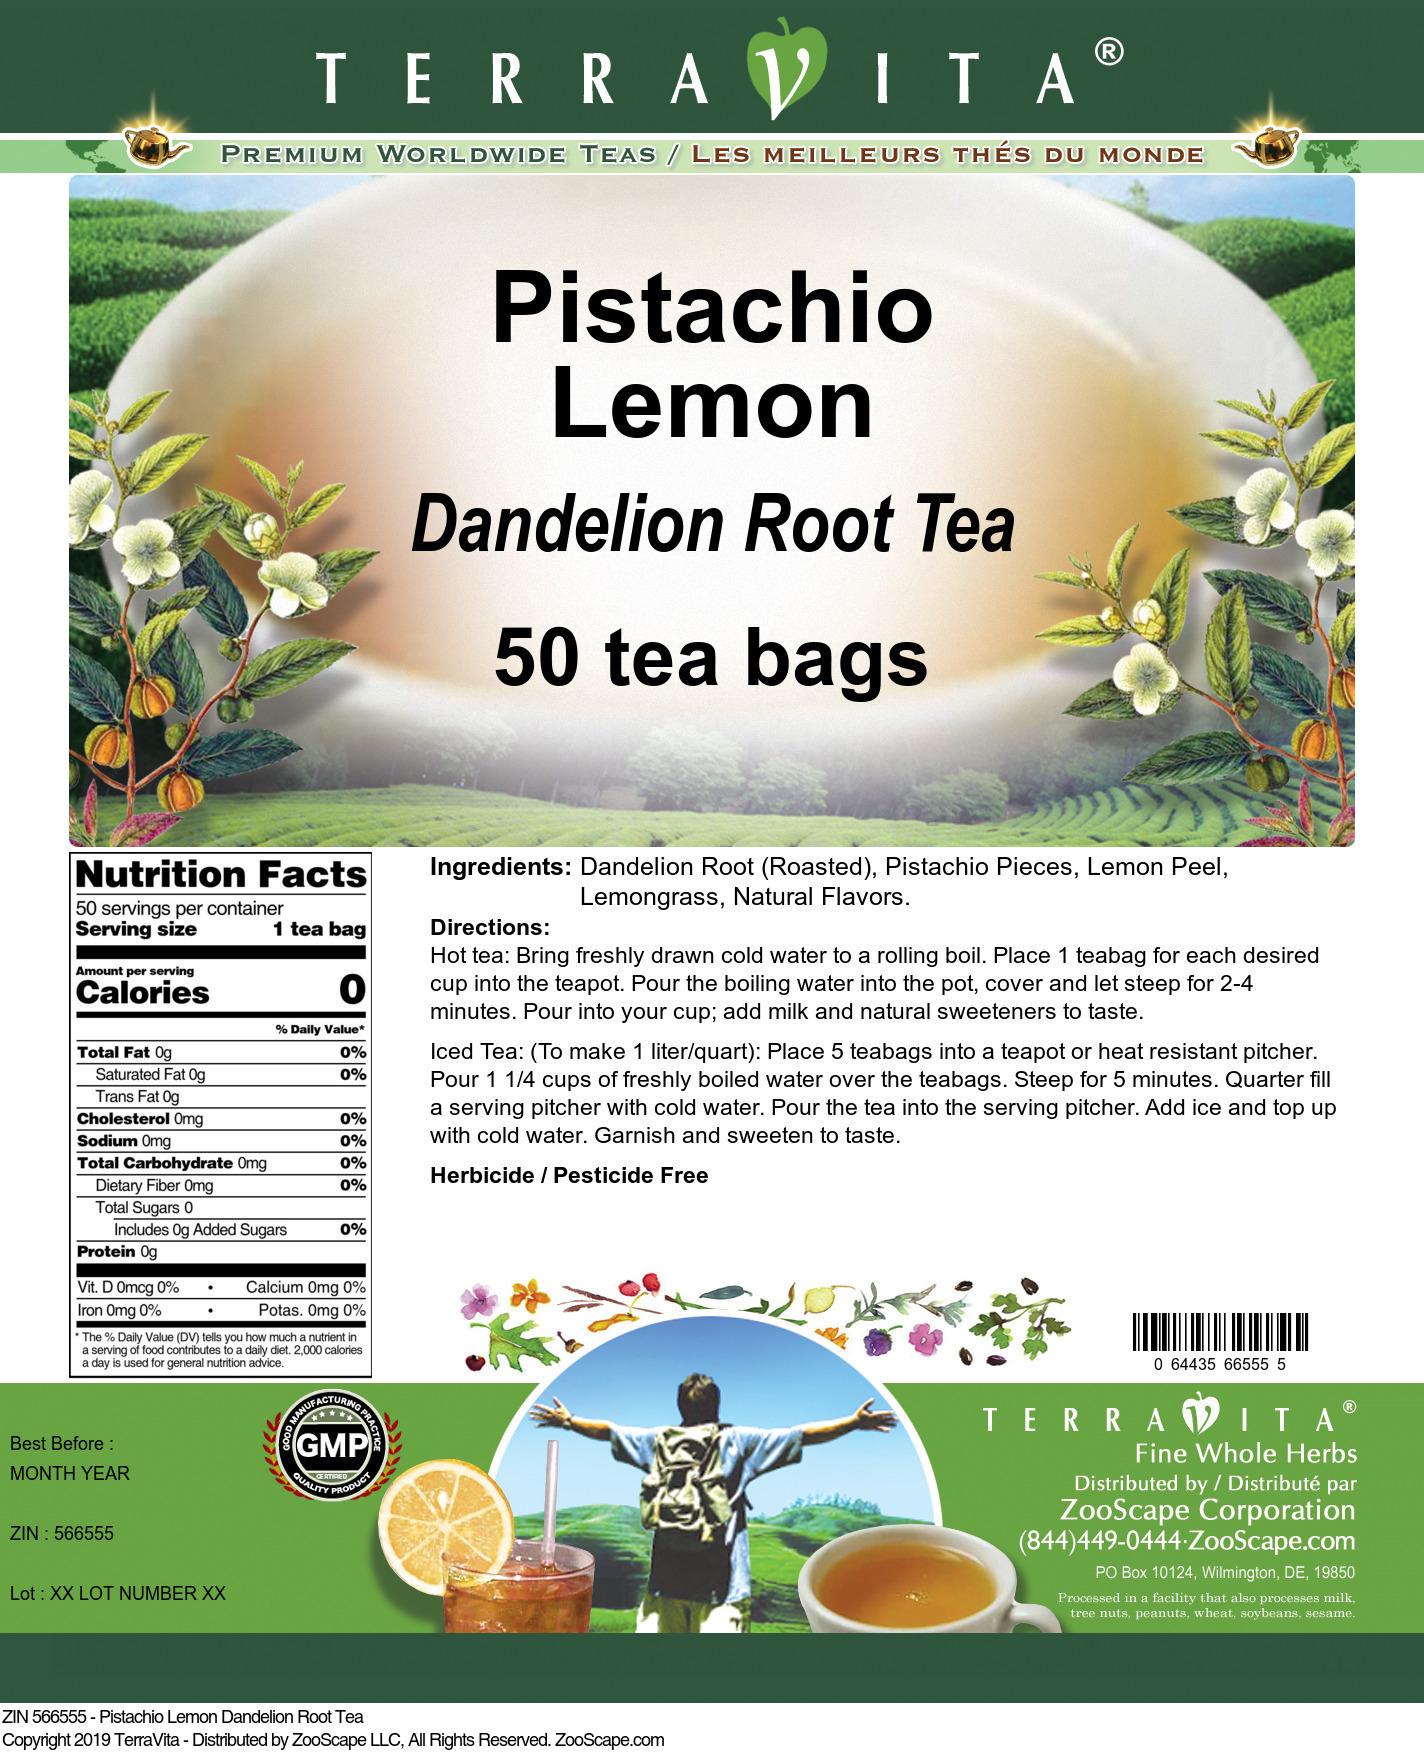 Pistachio Lemon Dandelion Root Tea